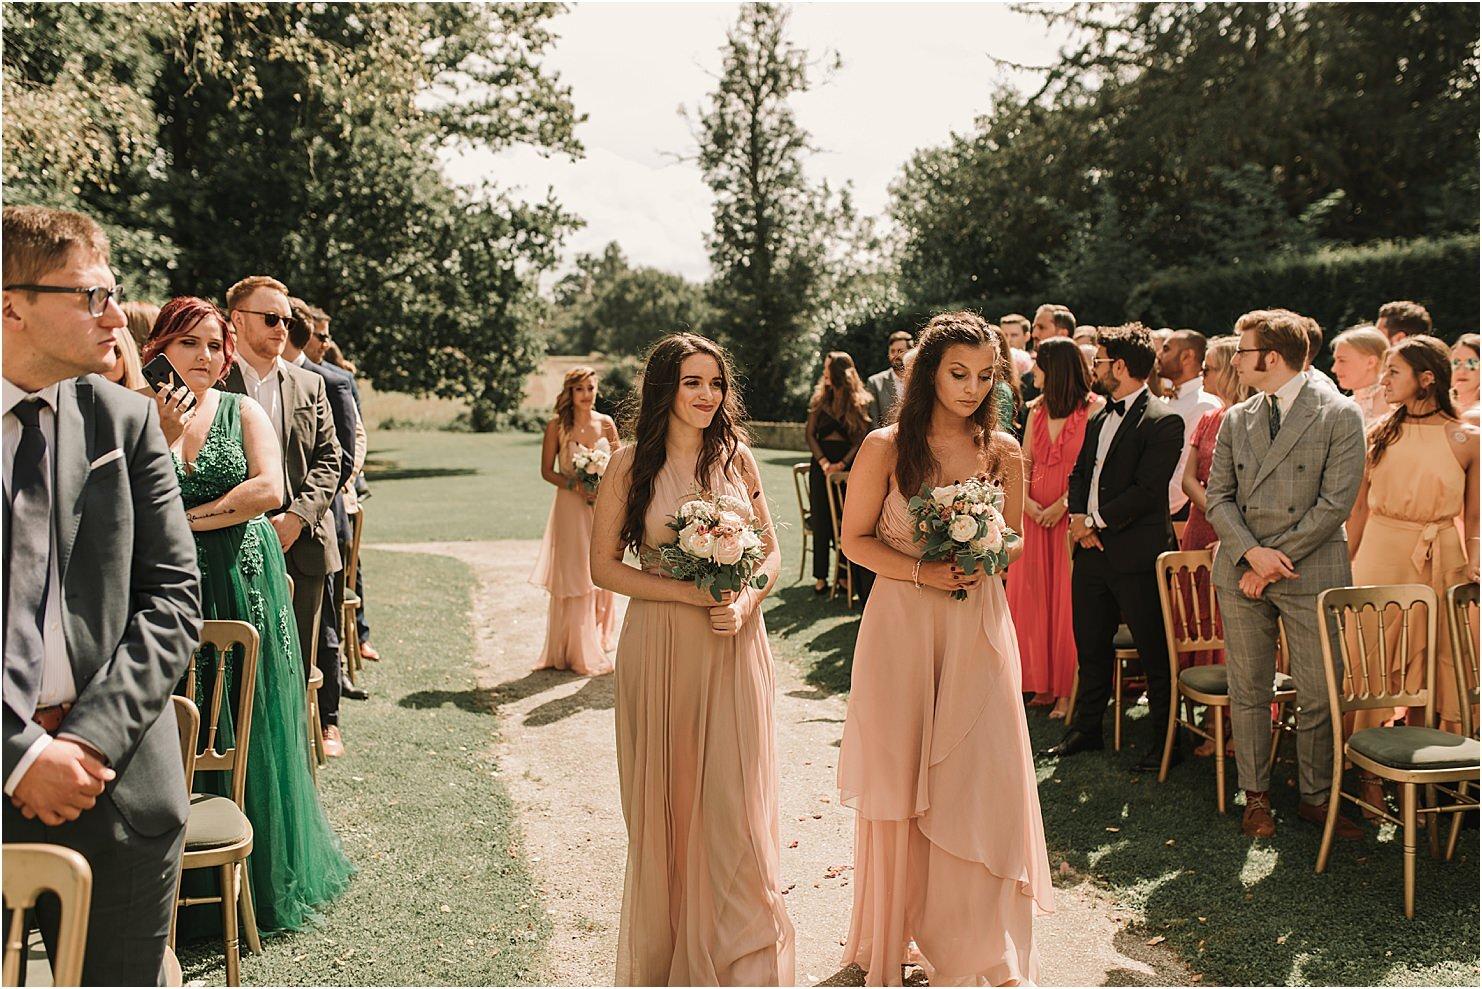 boda-de-cuento-en-castillo-boda-en-londres-46.jpg